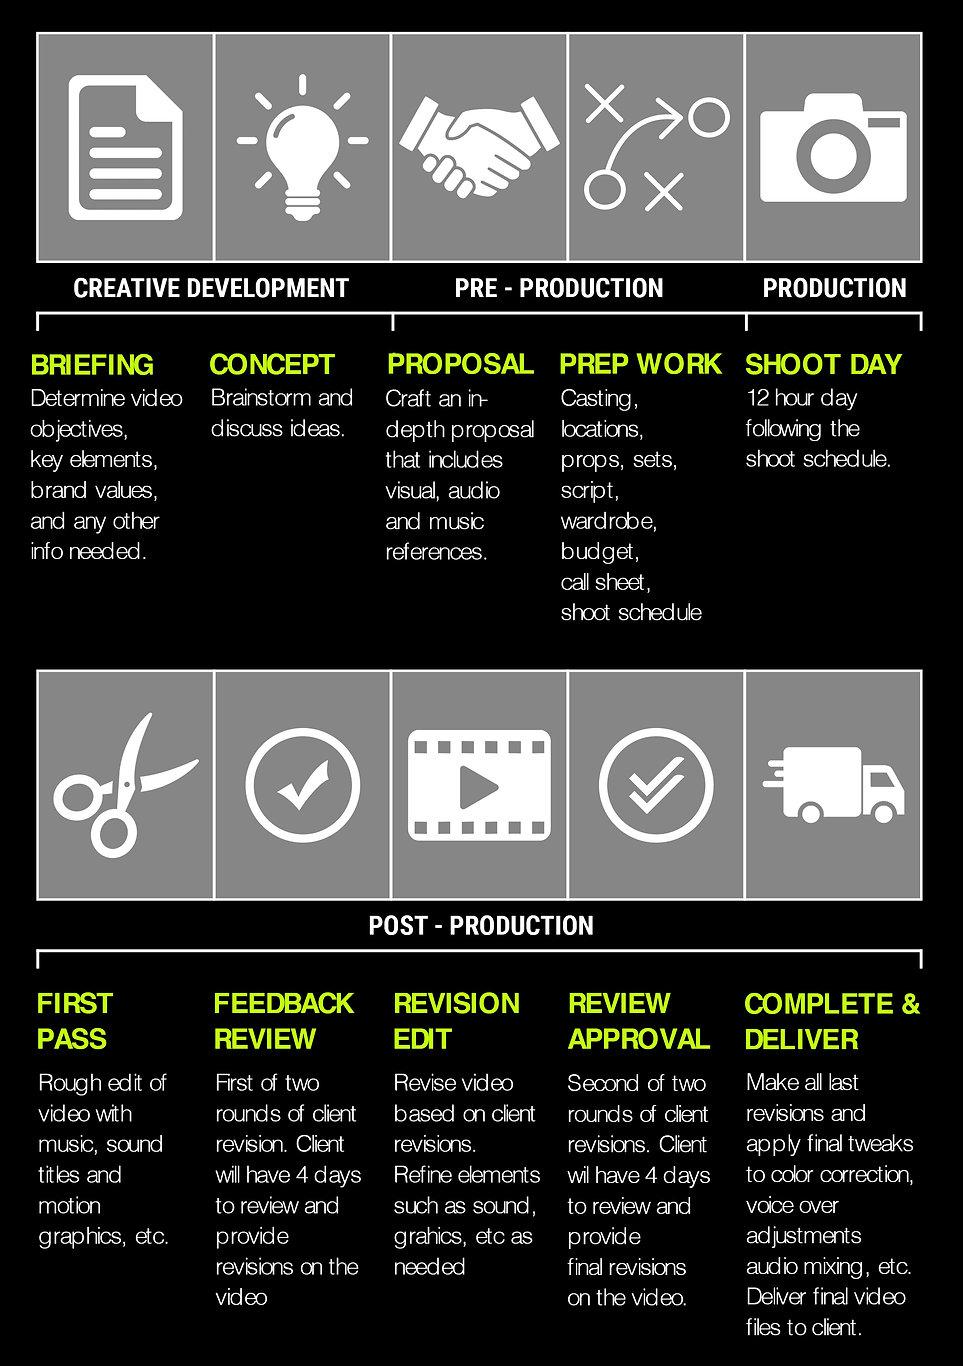 M3 VIDEO PRODUCTION PROCESS.jpg